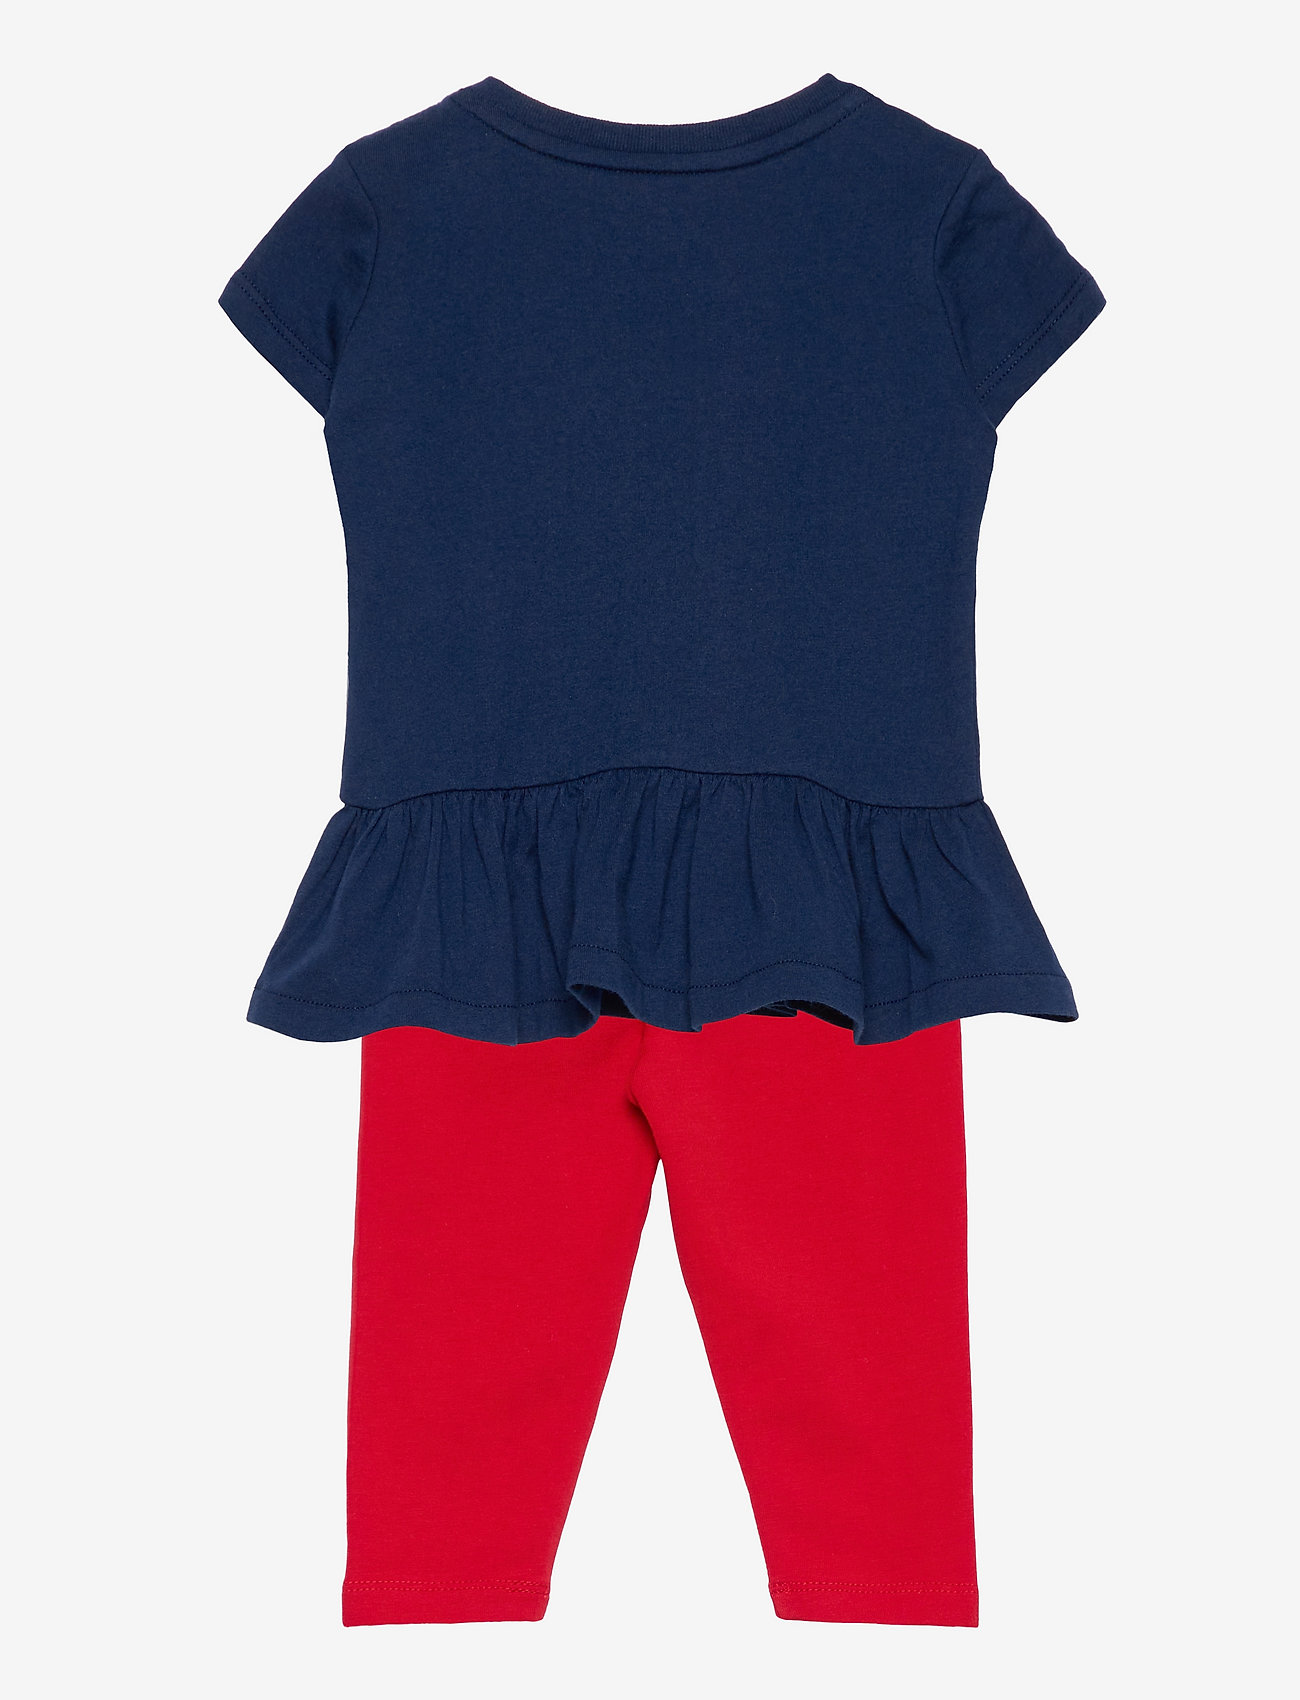 Ralph Lauren Baby - Big Pony Tee & Legging Set - kleider - french navy - 1